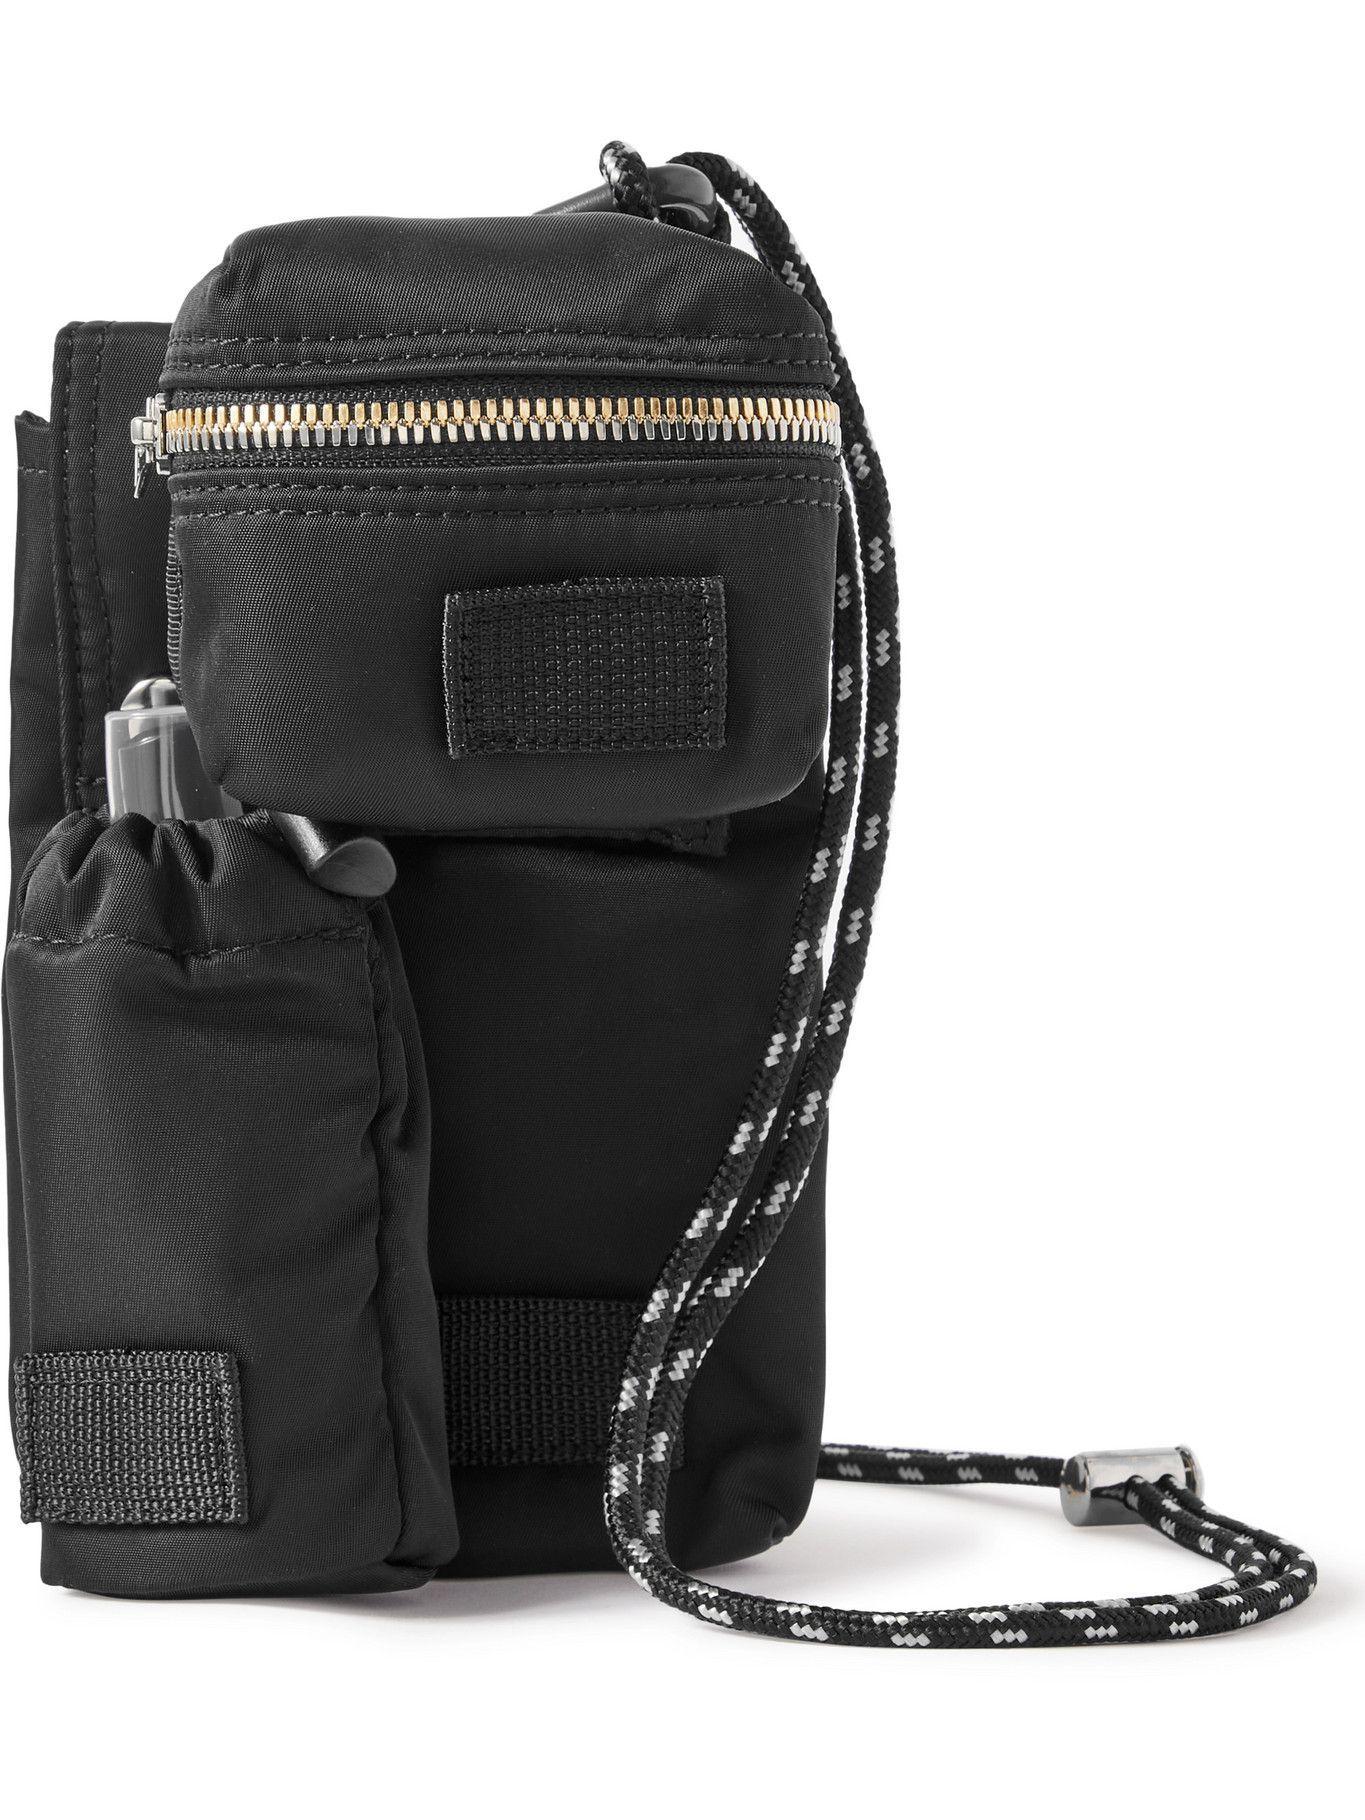 Sacai - Porter-Yoshida & Co Nylon Bag, Pouch and Bottle Holder Set